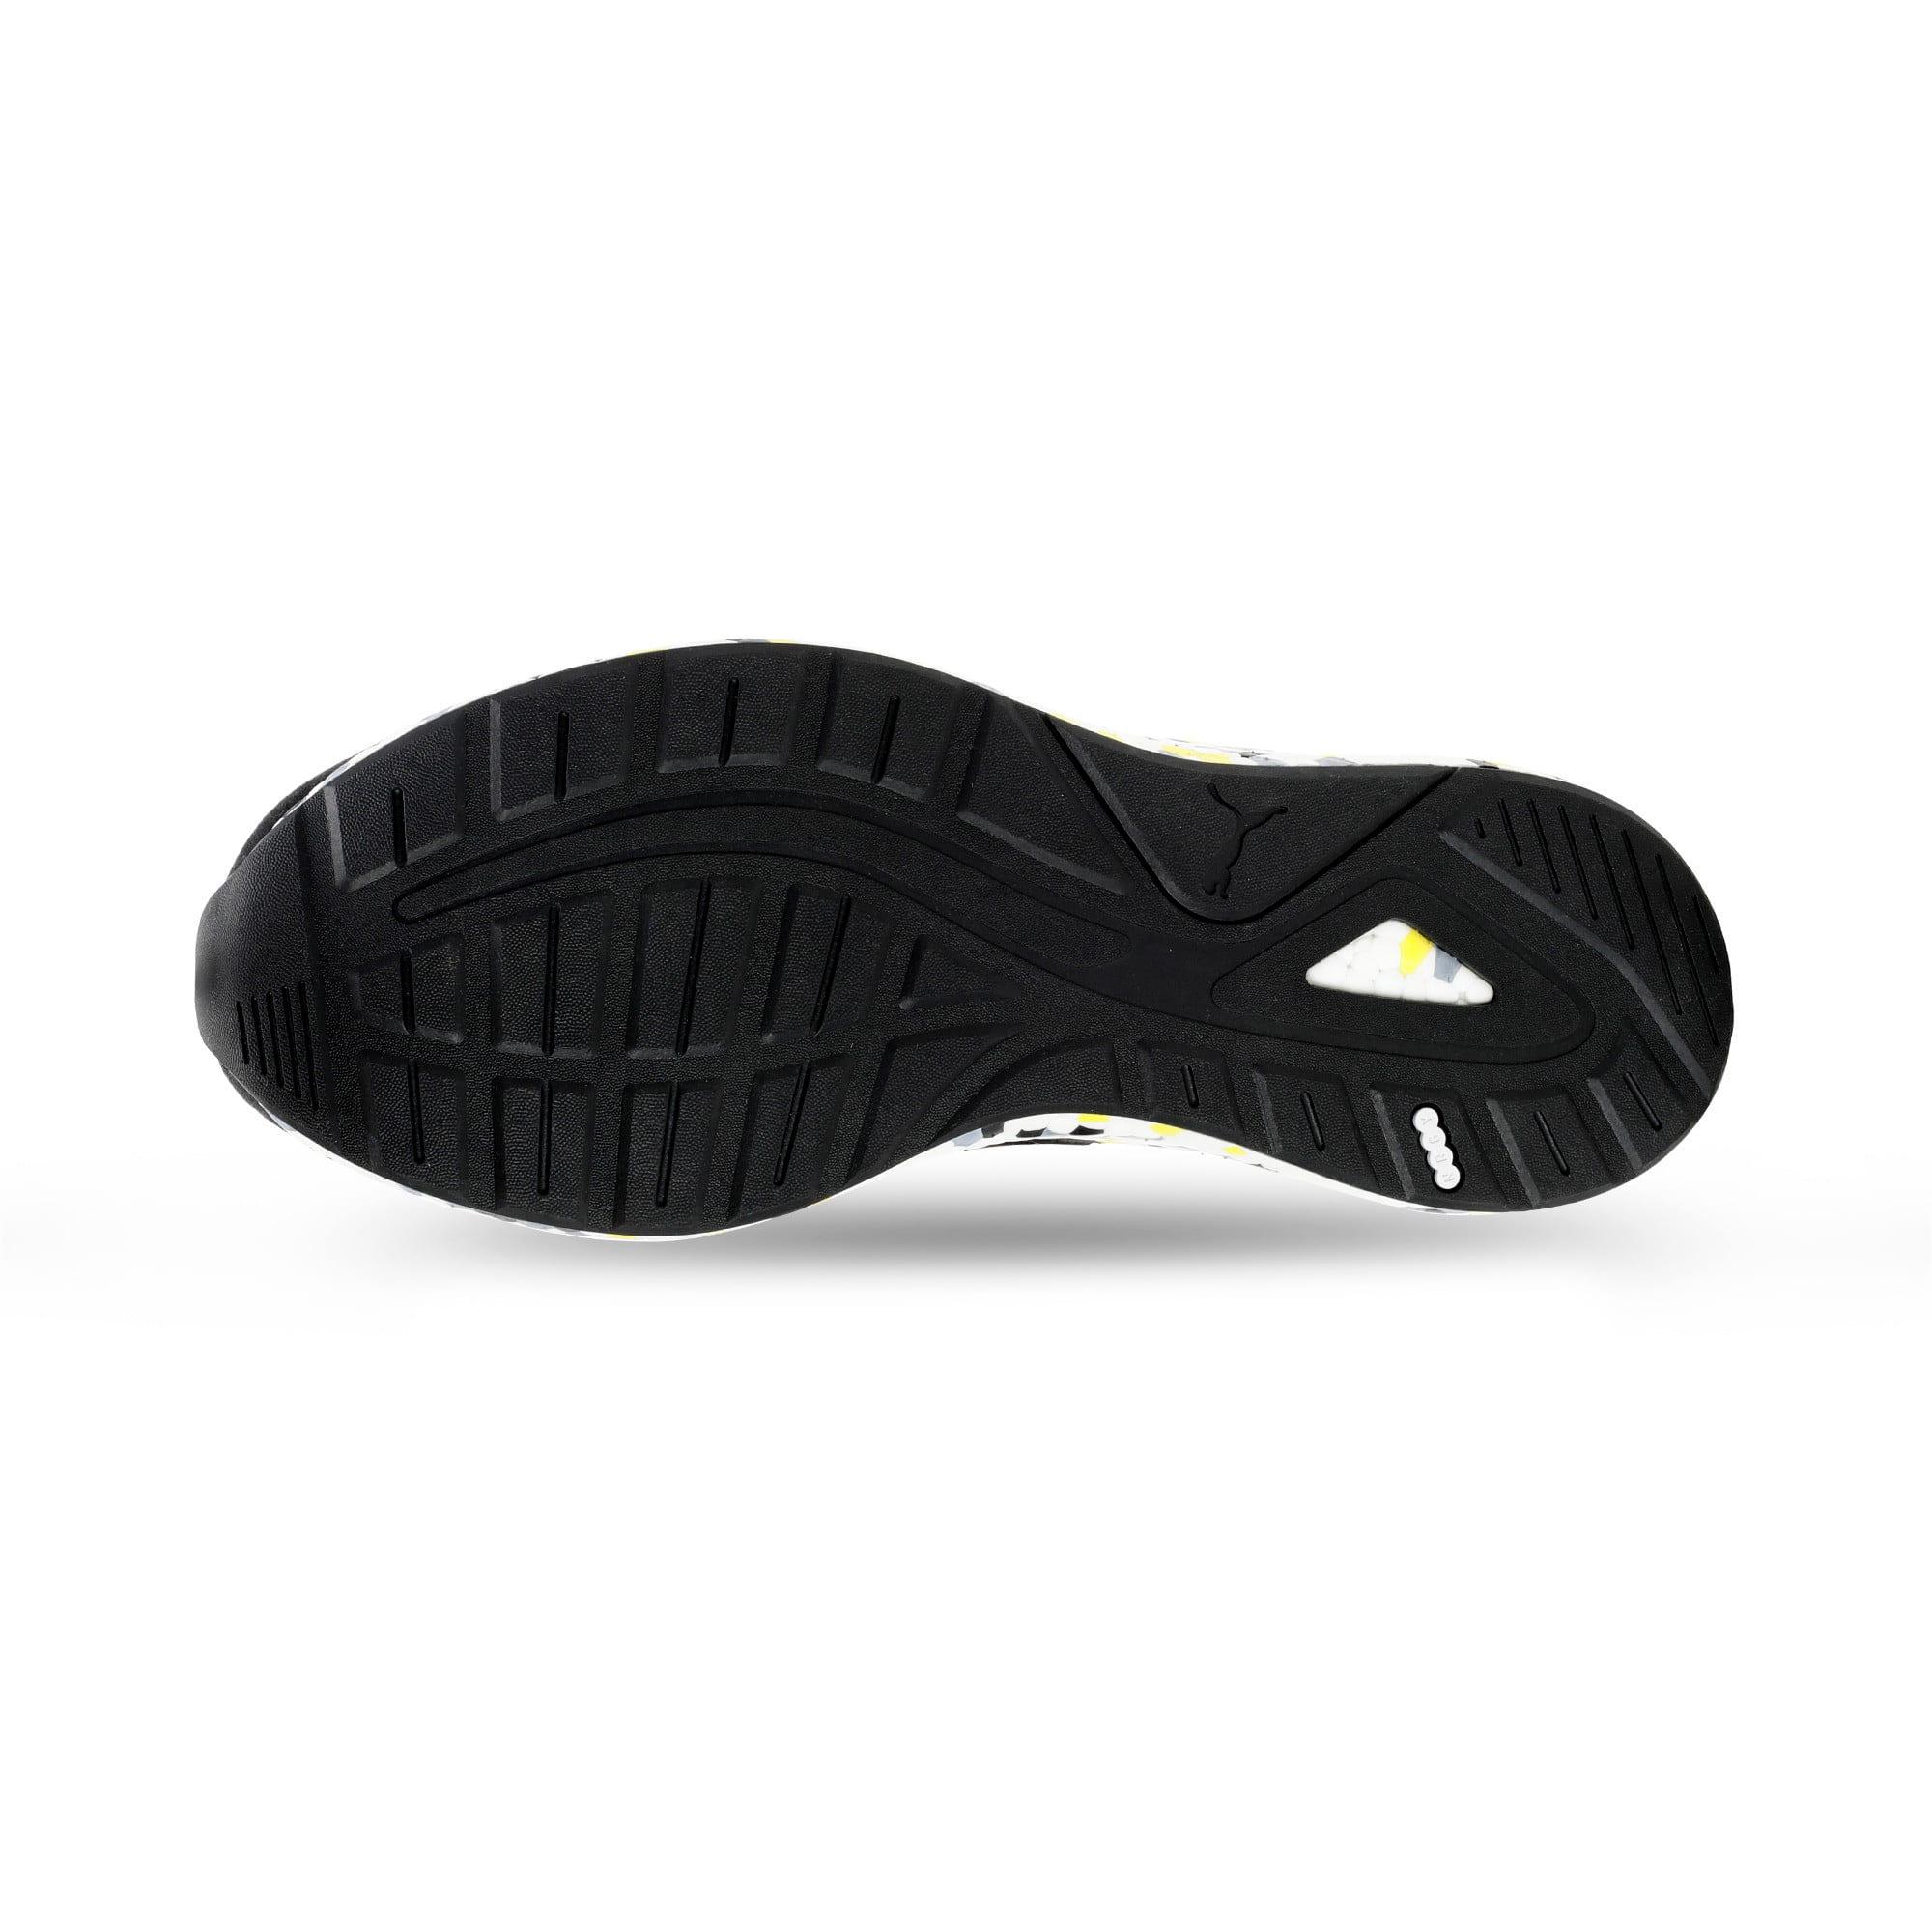 Thumbnail 6 of NRGY Neko Skim Men's Running Shoes, Puma Black-Yellow Alert, medium-IND